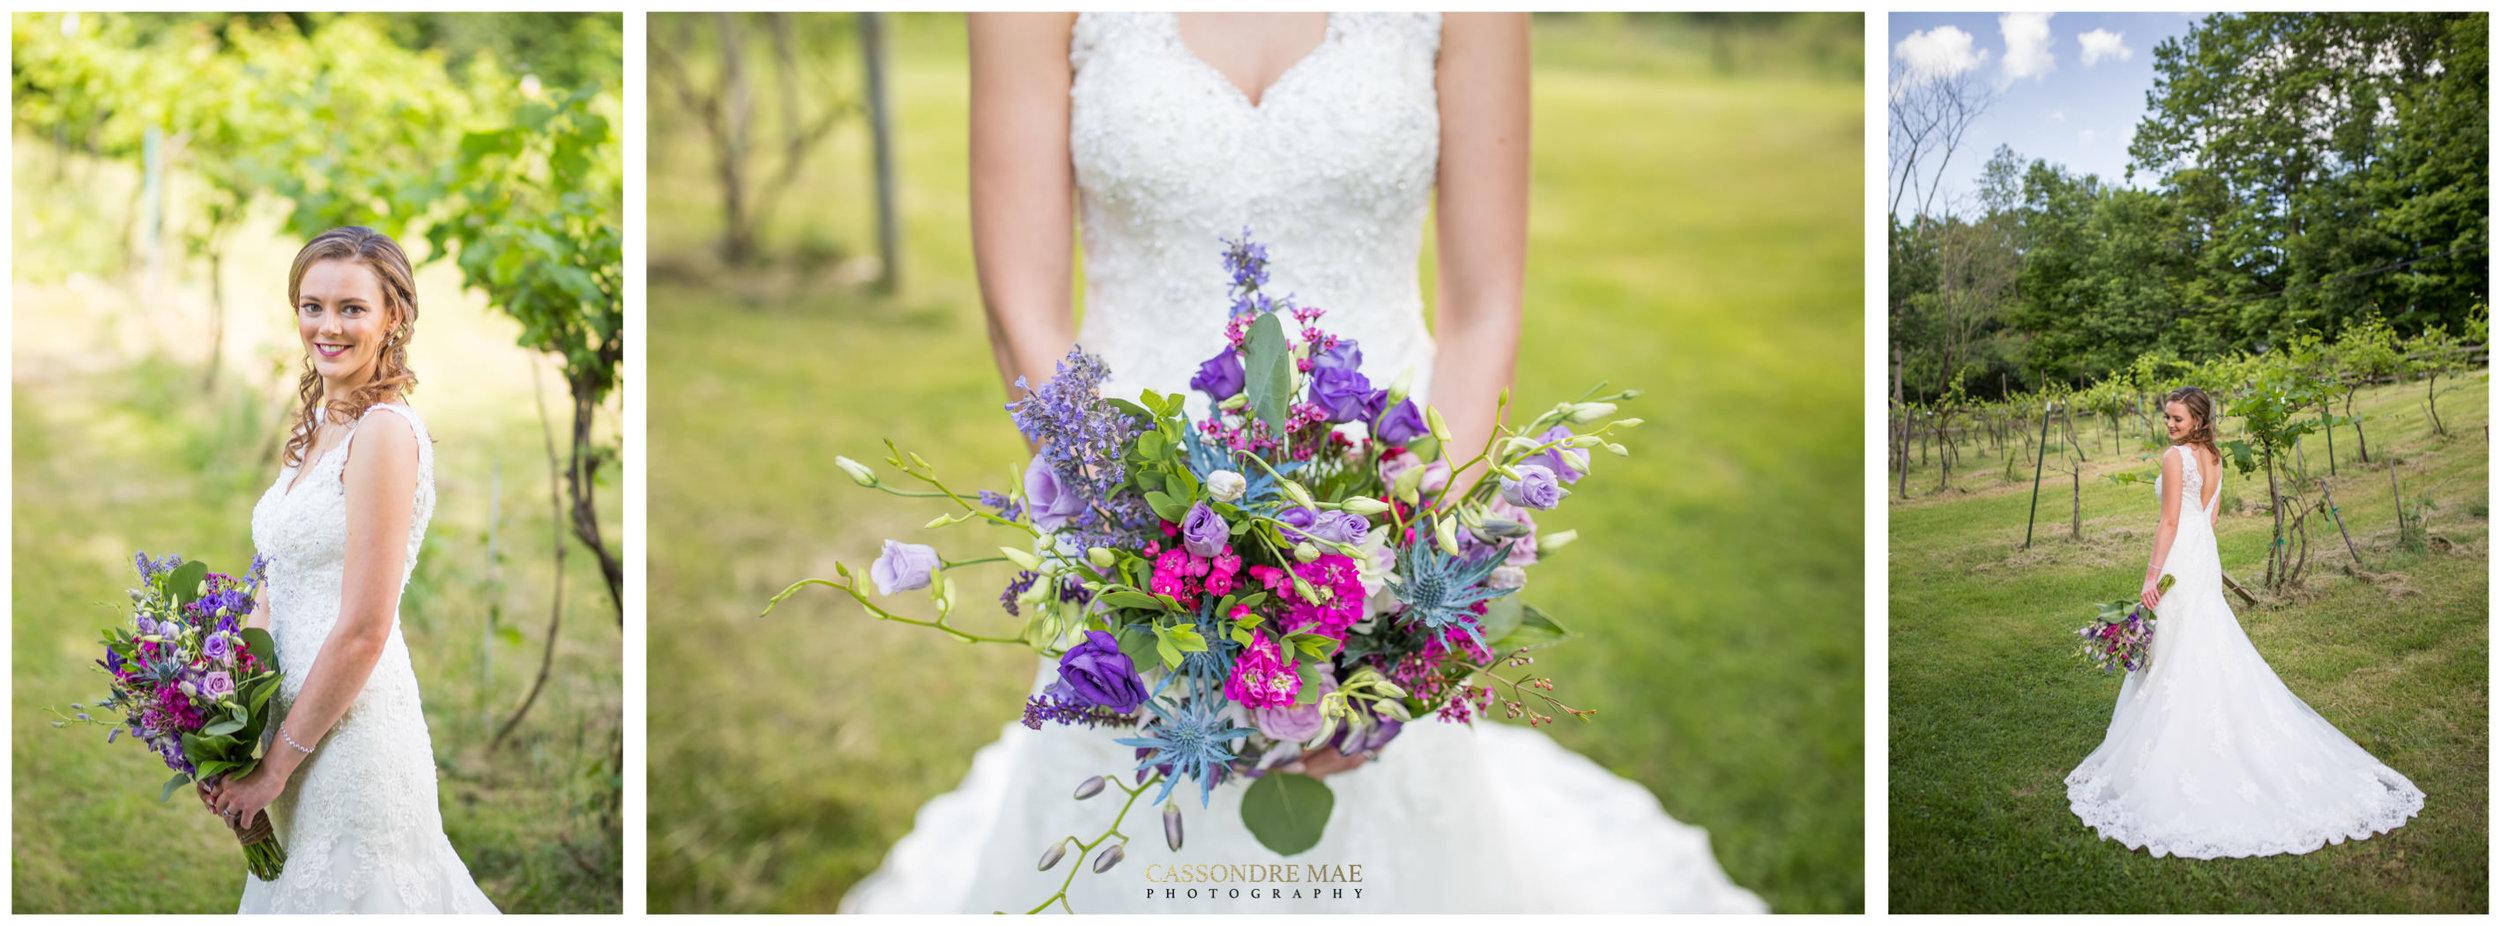 Cassondre Mae Photography hudson valley barn weddings -1.jpg